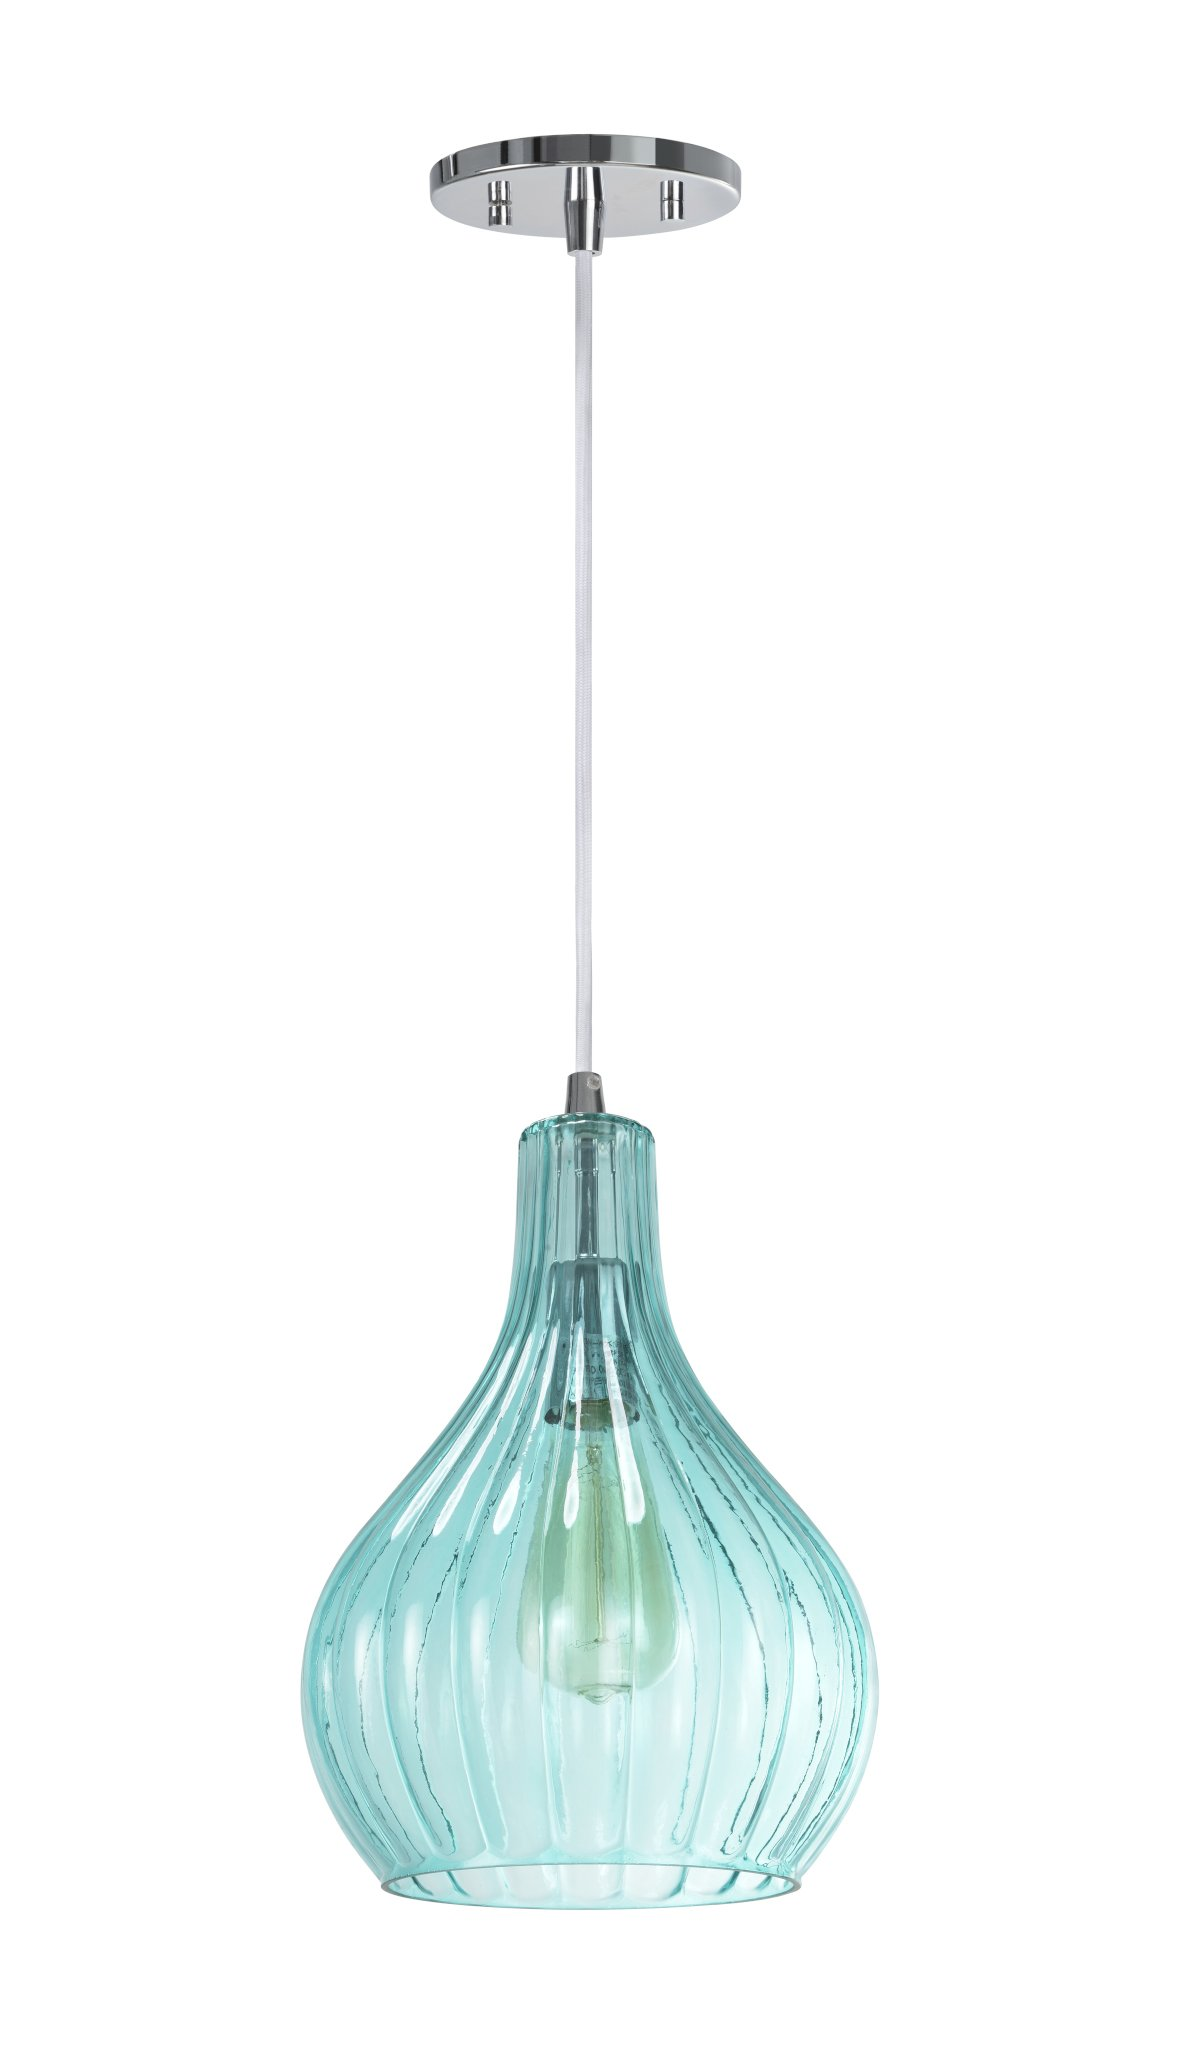 Aspen Creative 61039-1 Adjustable 1 Light Mini Pendant Ceiling Light, Transitional Design in Chrome Finish, Surf Green Glass Shade, 8 5/8'' Wide by Aspen Creative